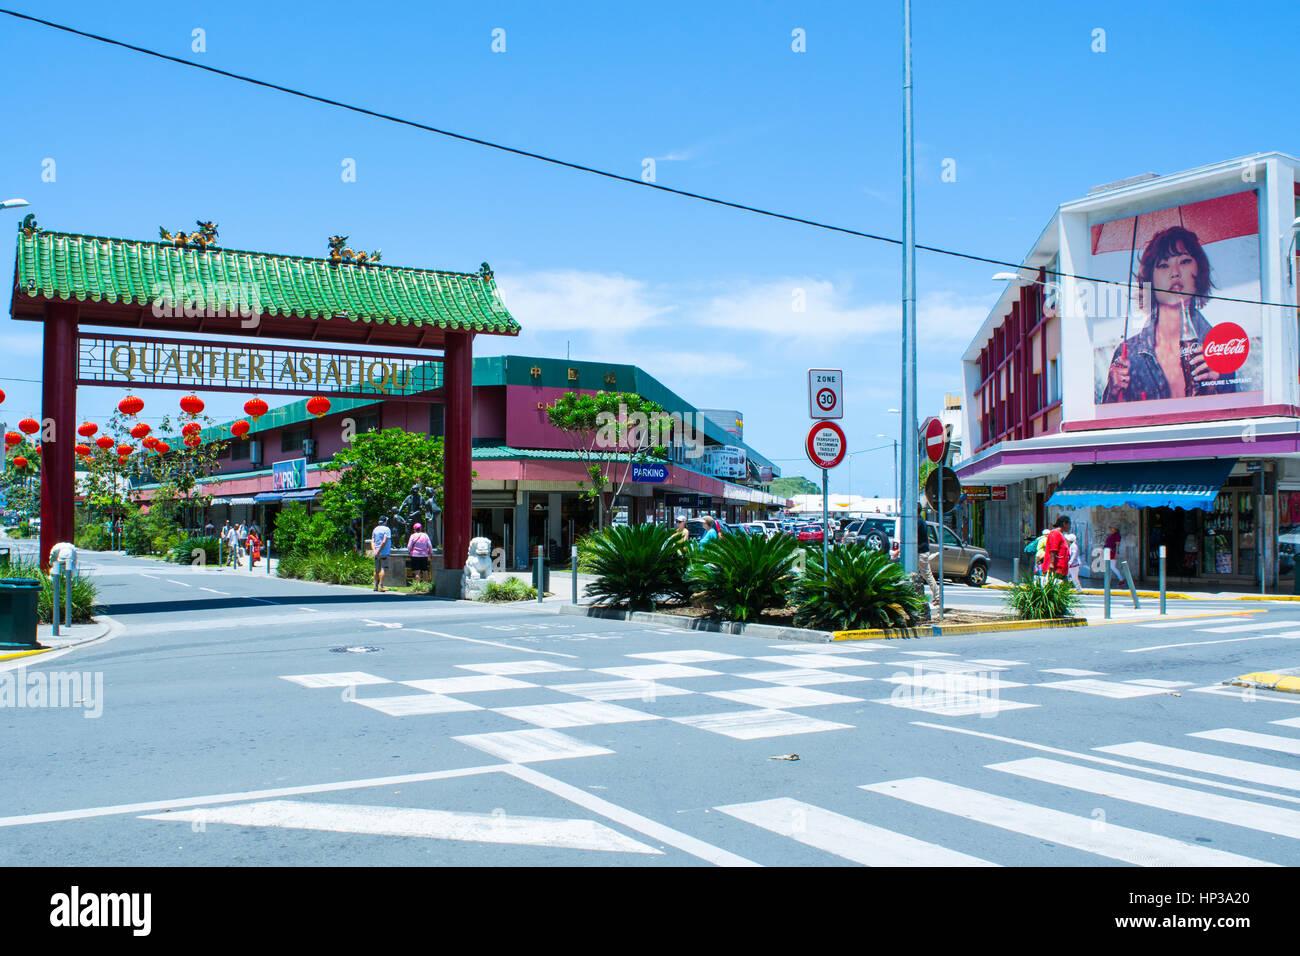 Asian Quarter Noumea New Caledonia - Stock Image